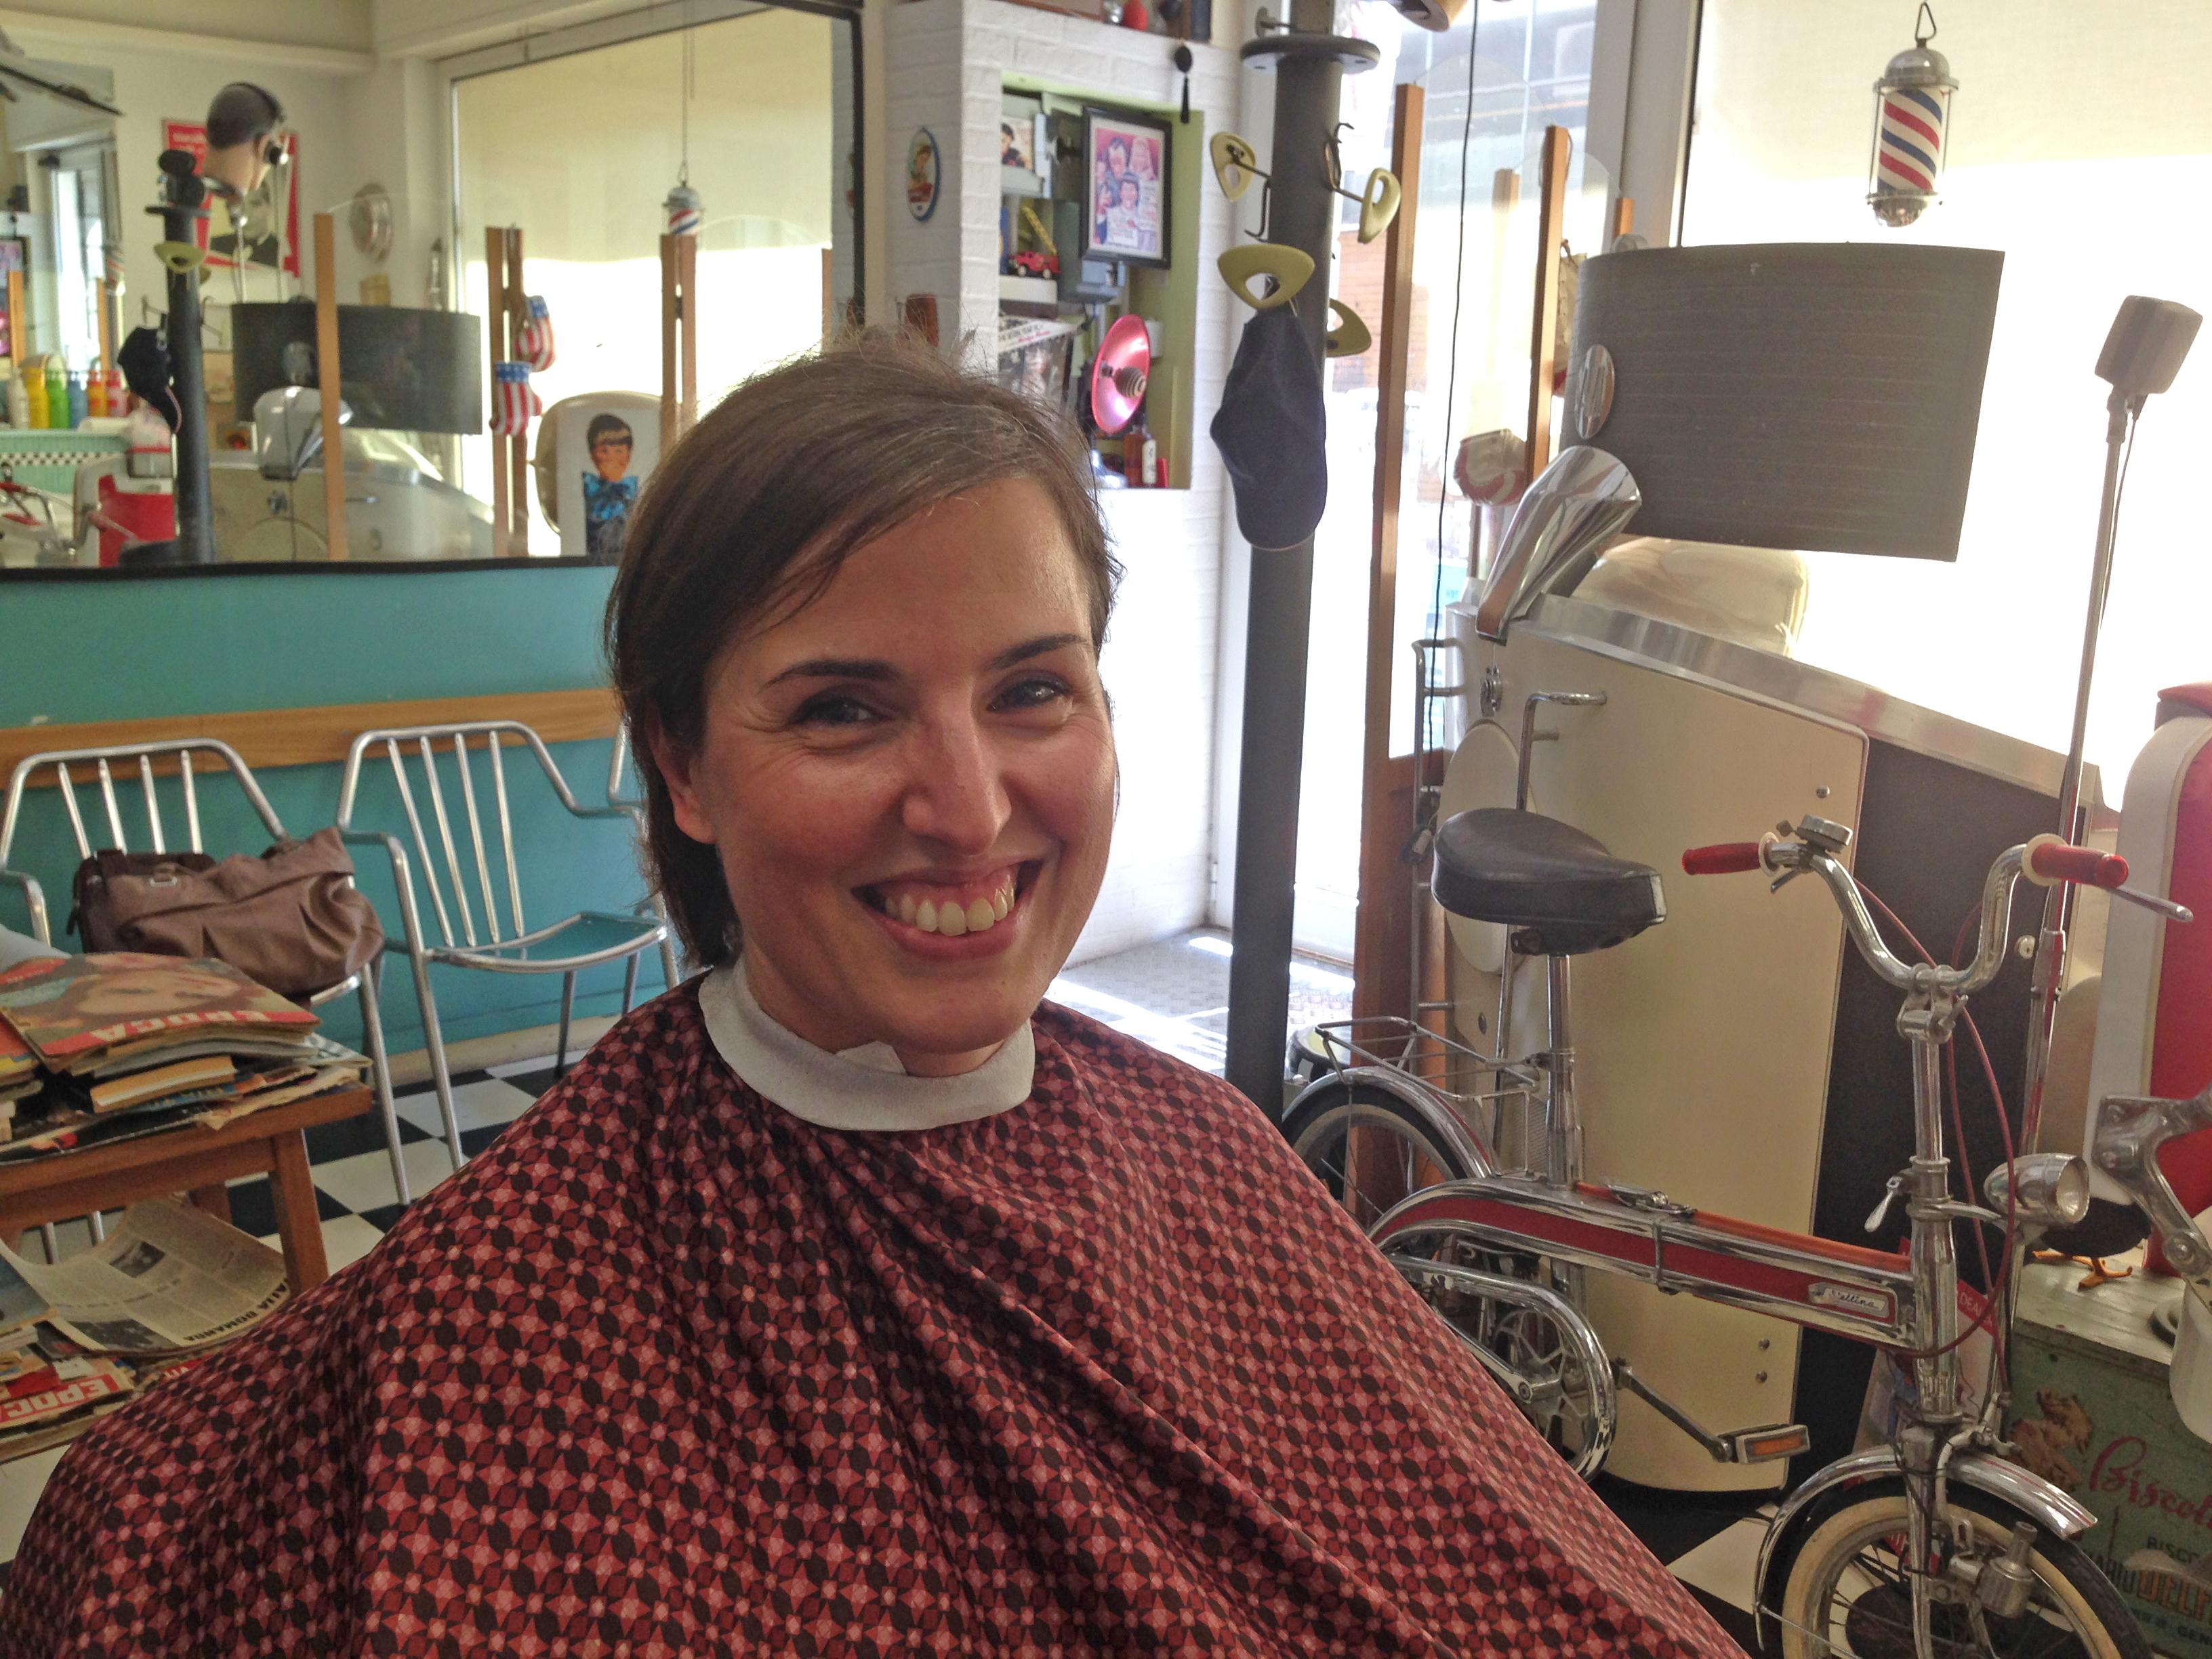 Haircut barbershop ladies in Local Barber